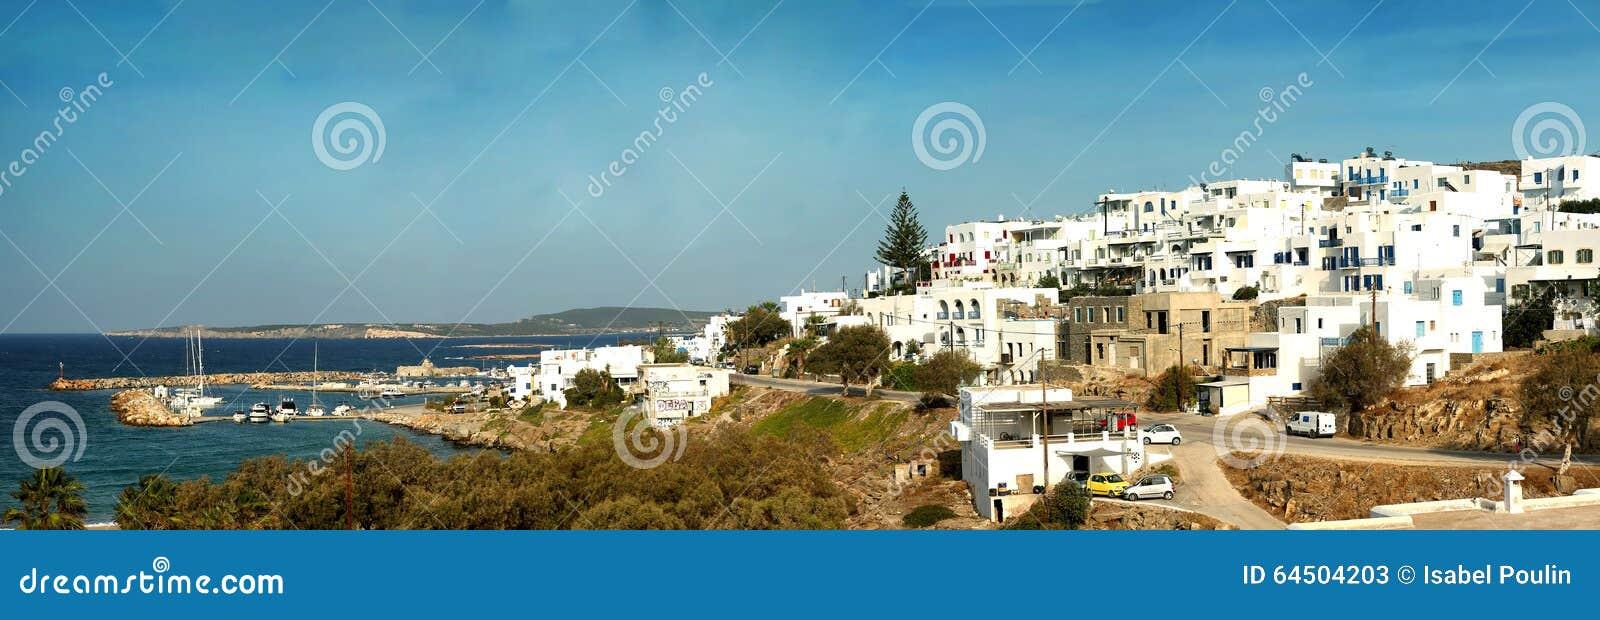 Panorama of Naxos in Greece